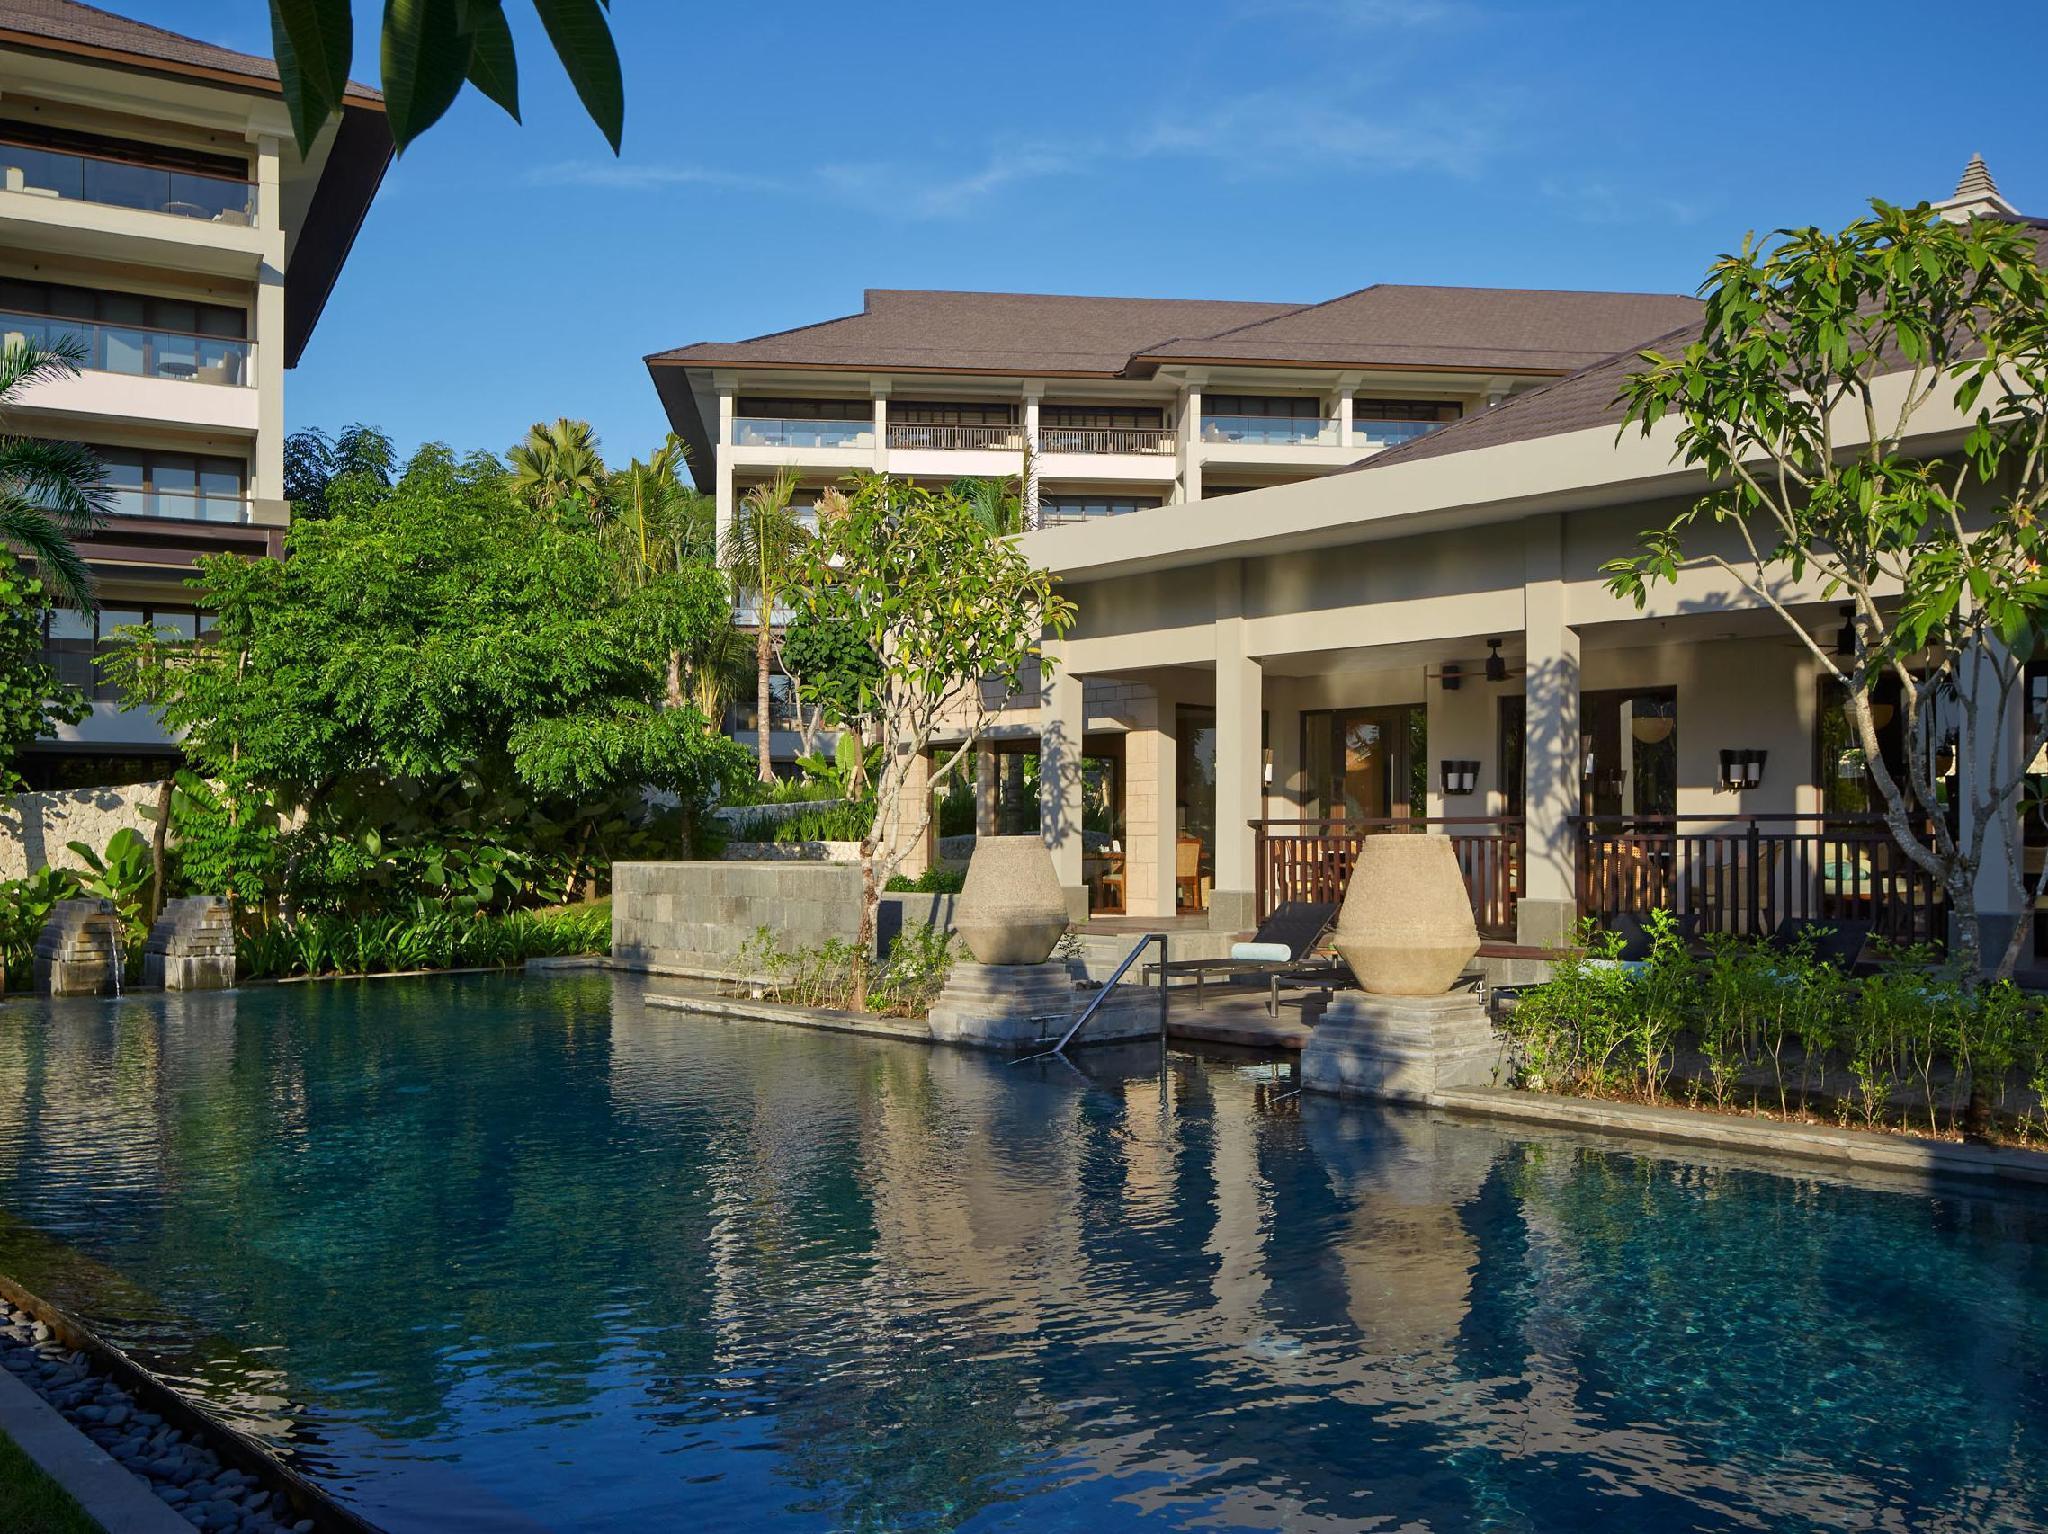 The Ritz-Carlton Bali17